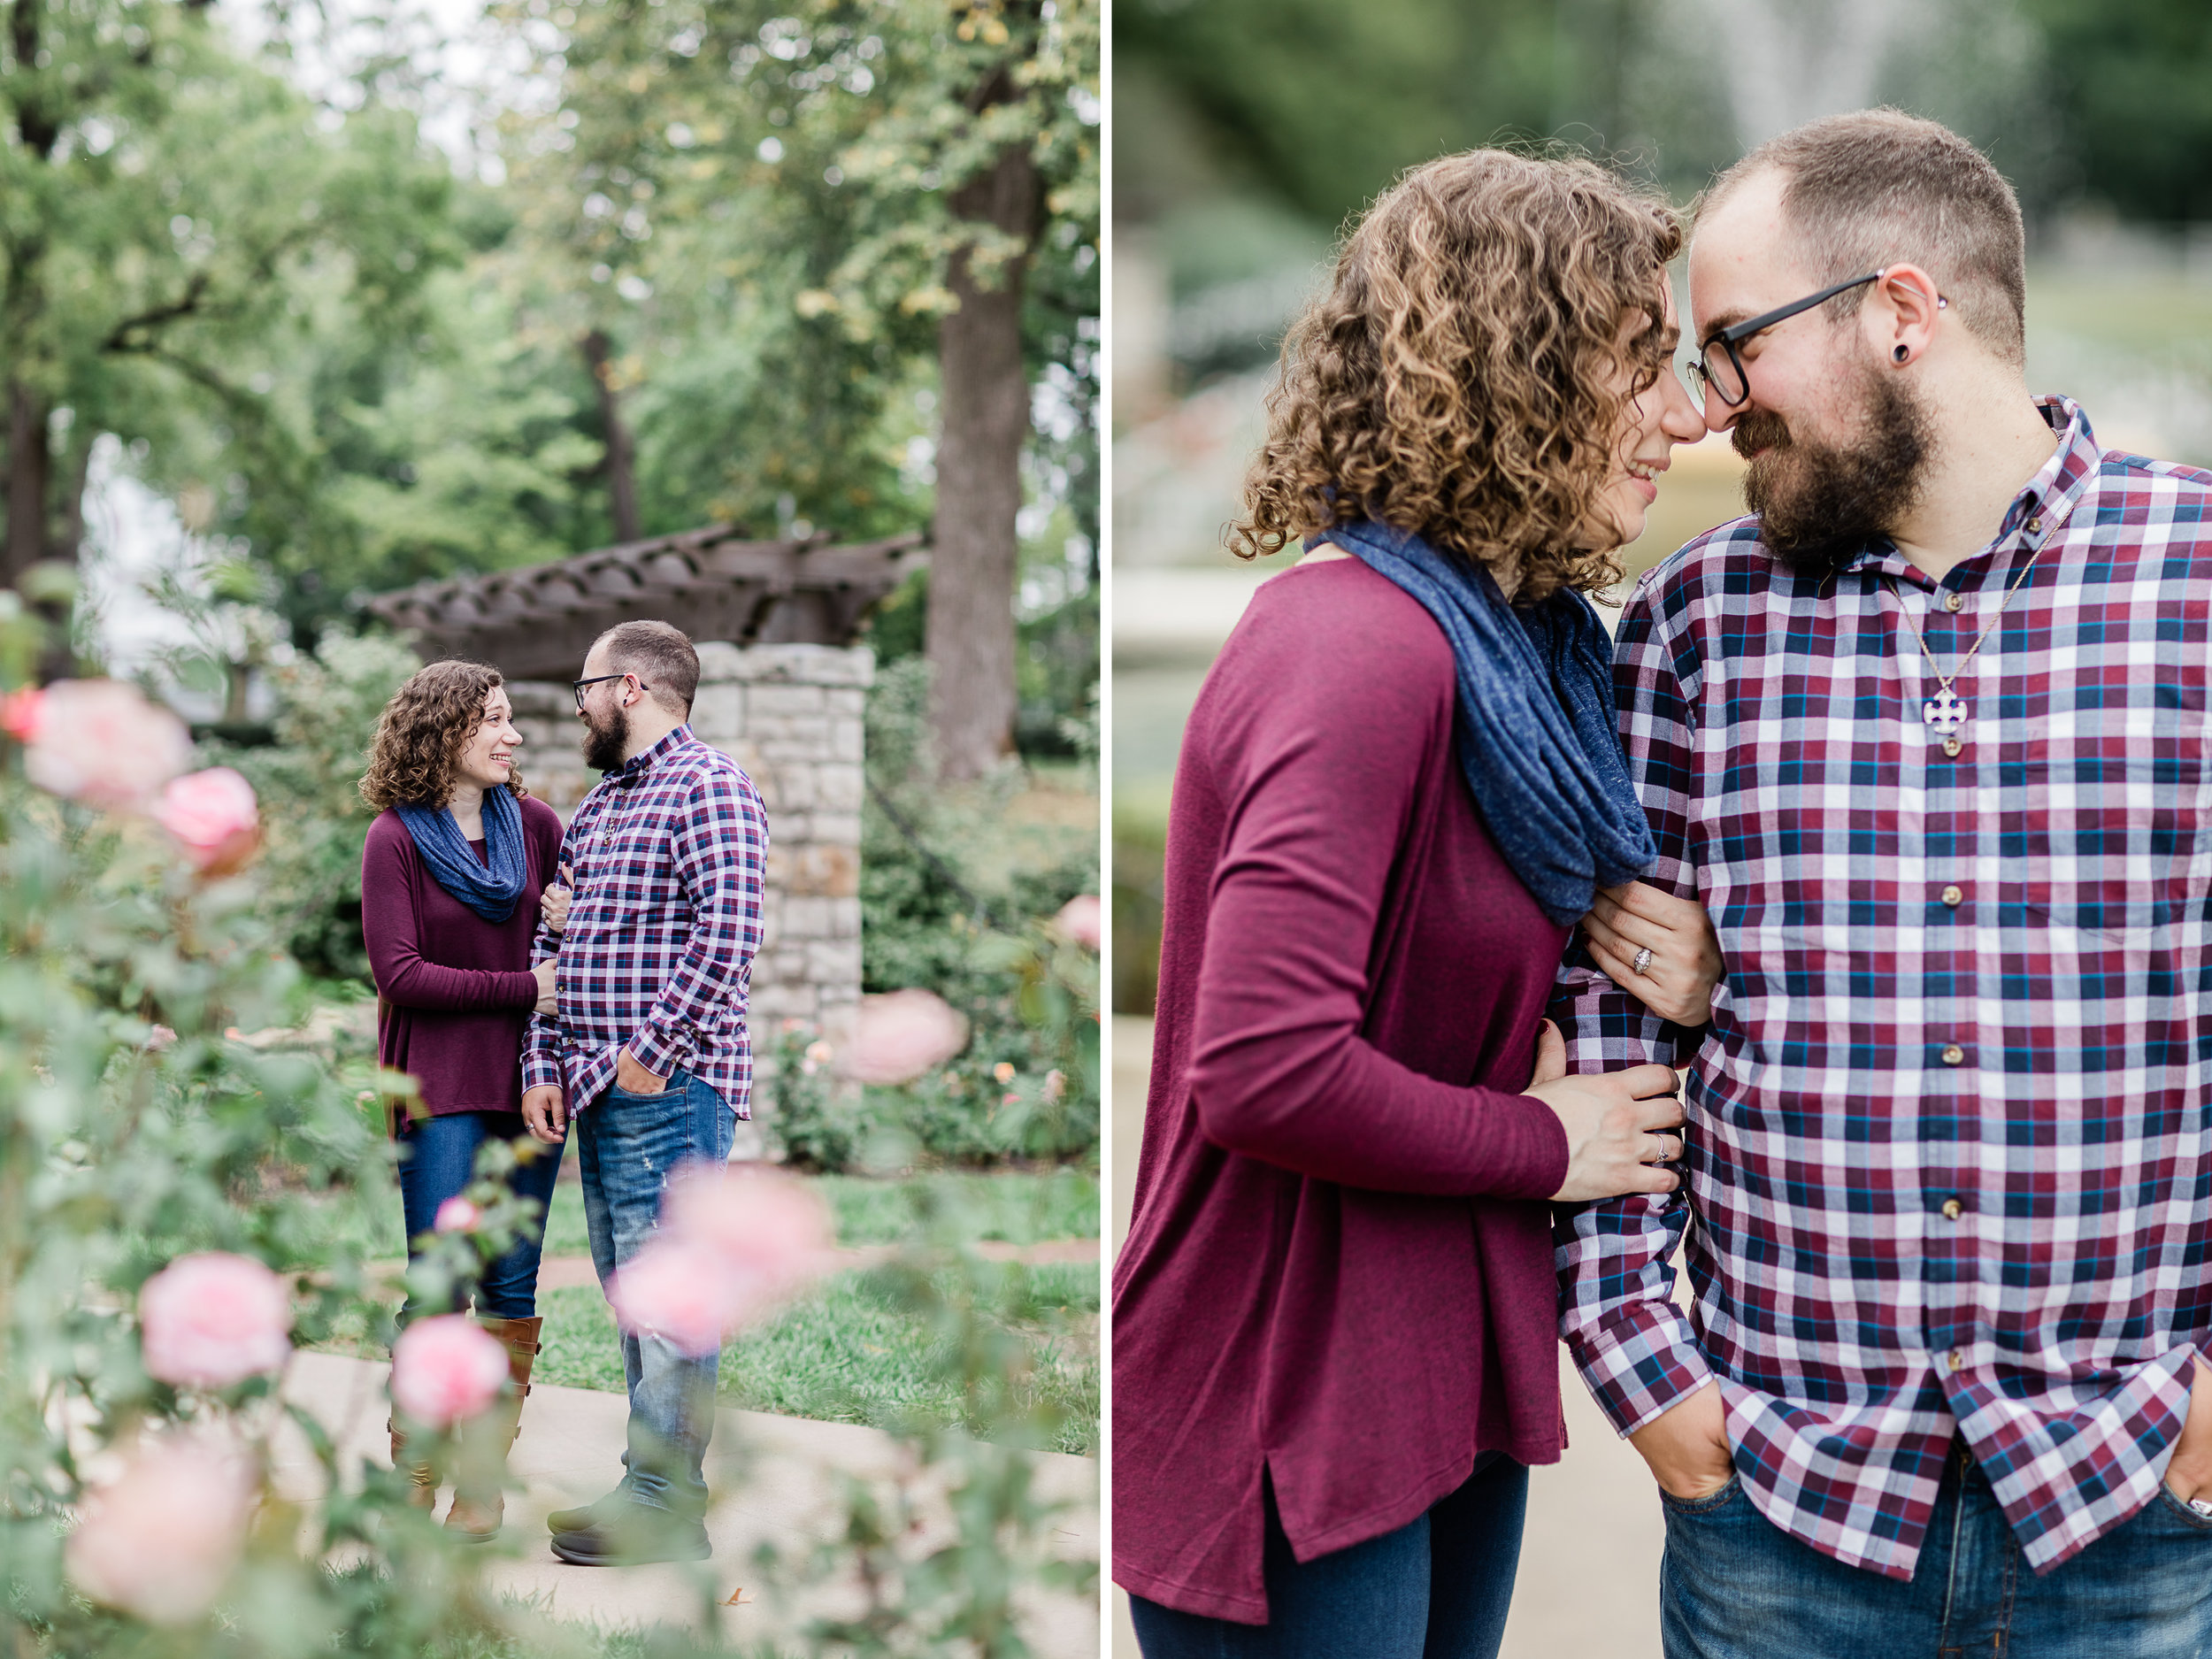 Loose Park Rose Garden Engagement Photos 1.jpg